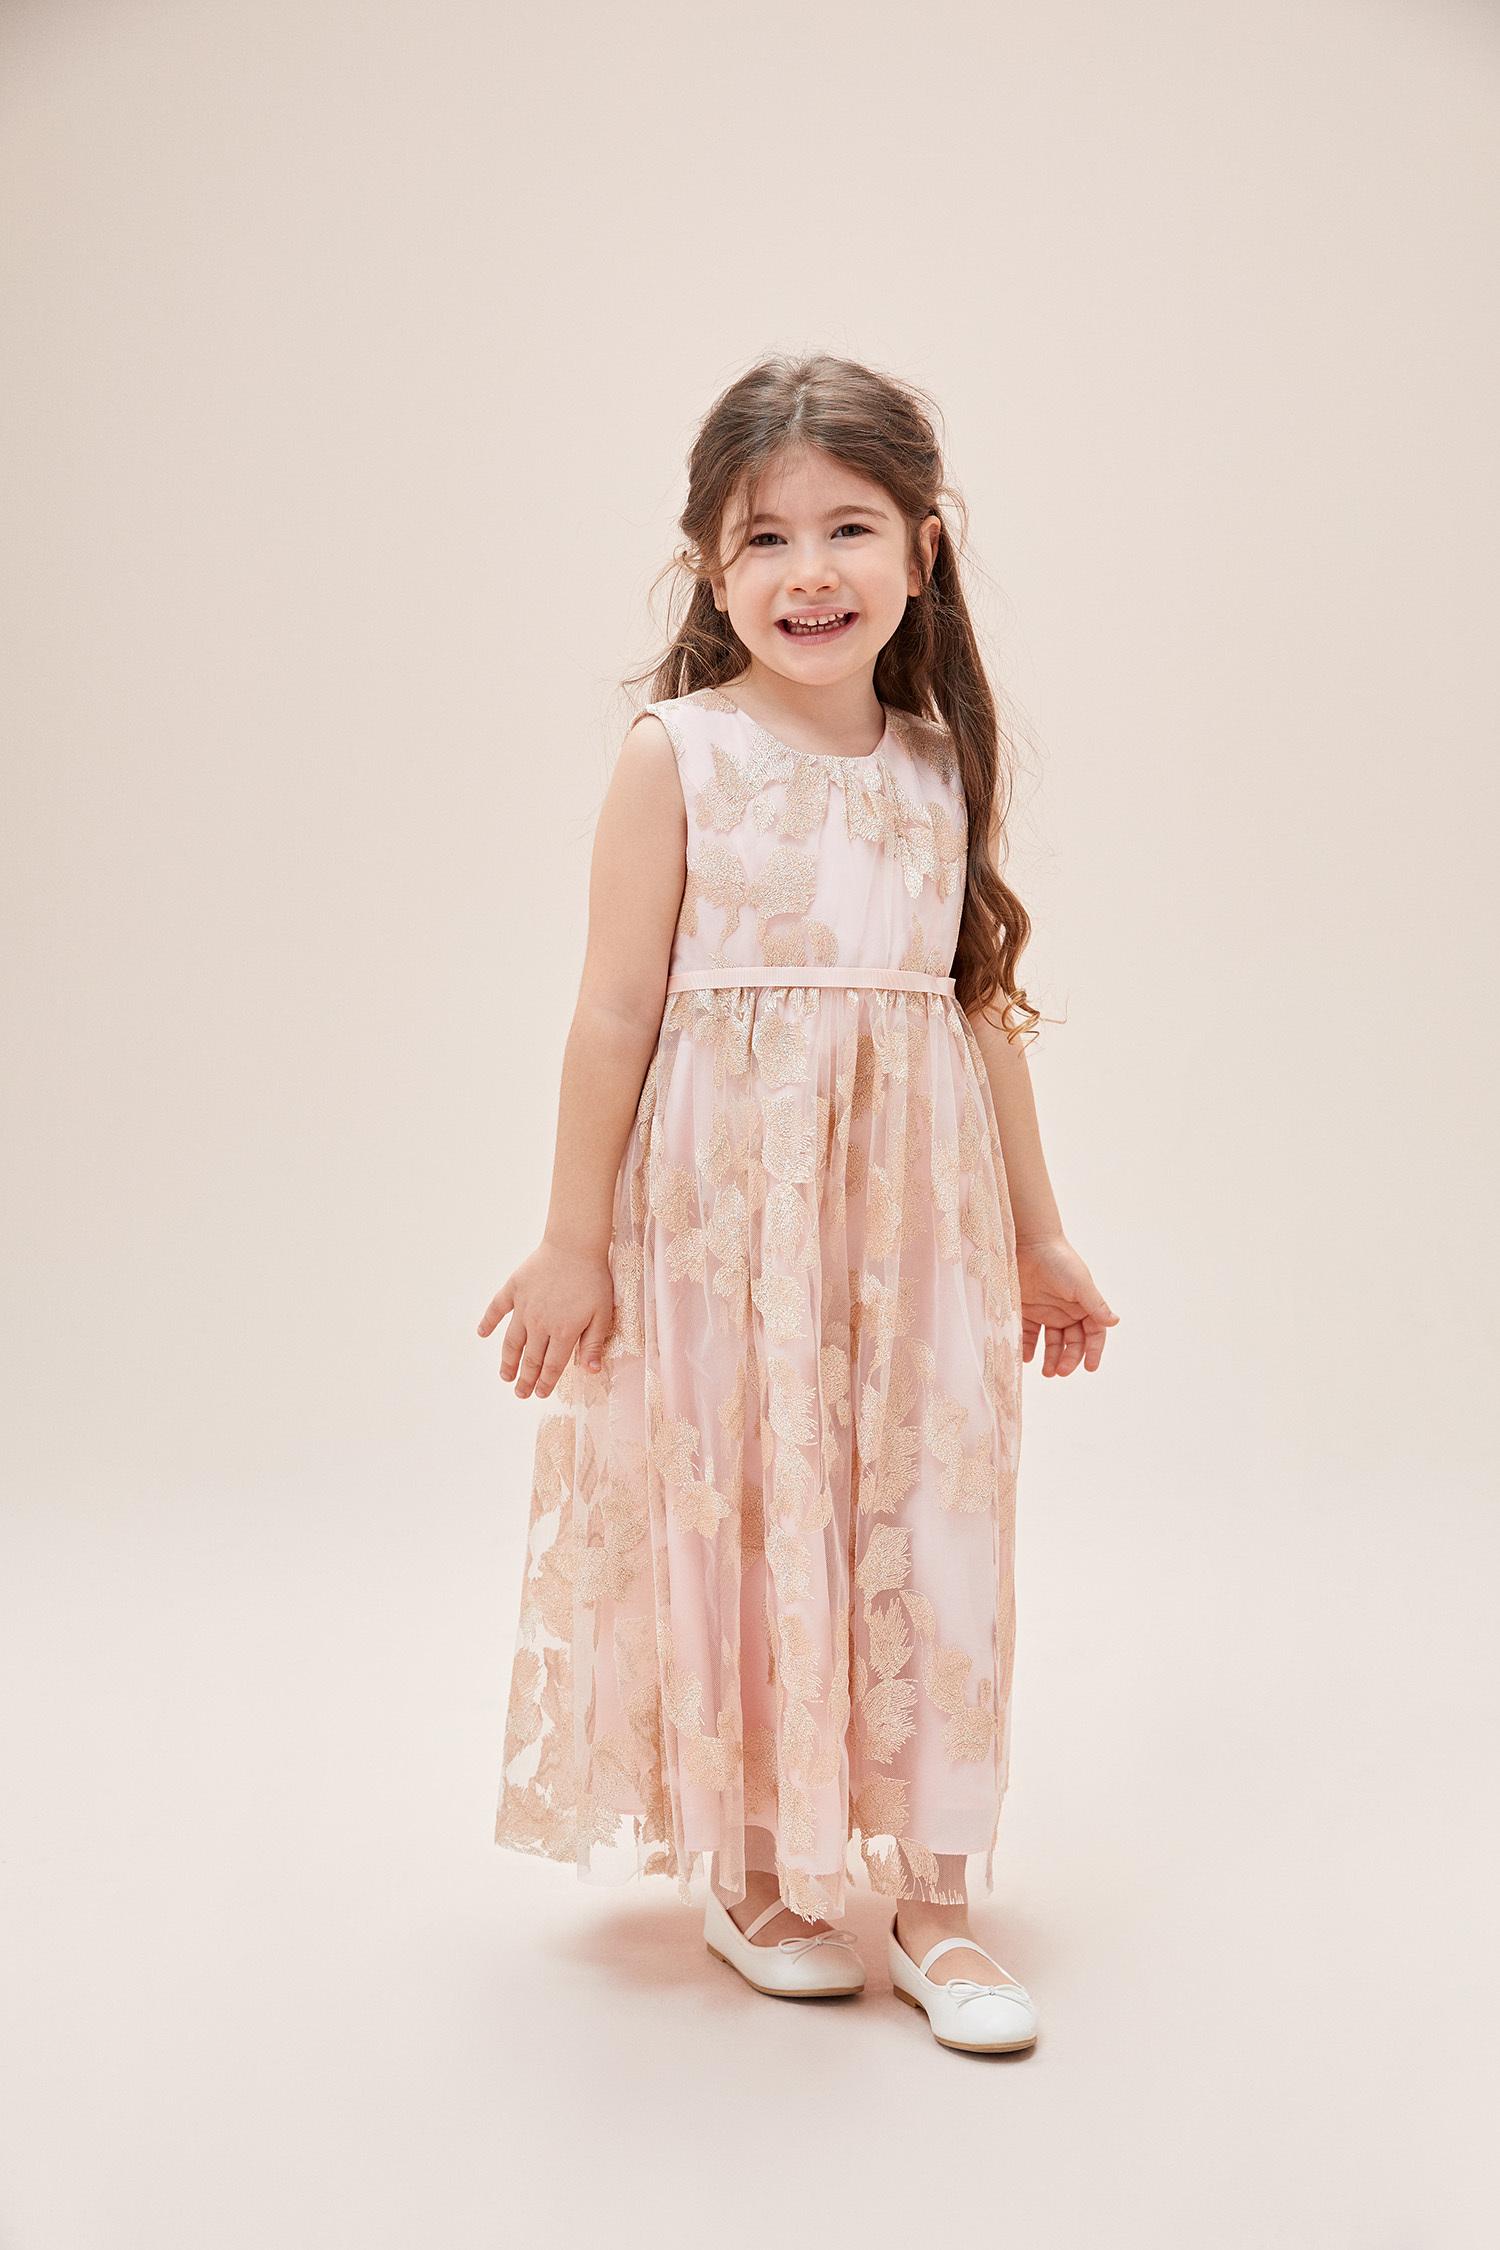 Toz Pembe Desenli Askılı Çocuk Elbisesi - Thumbnail